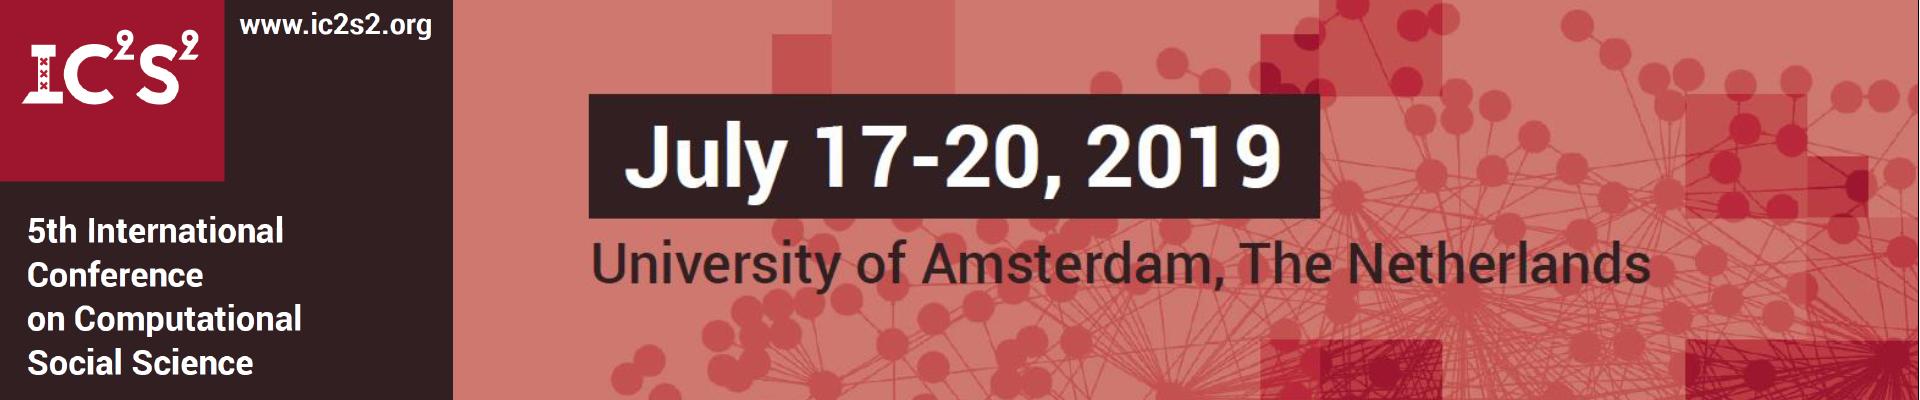 IC2S2 2019 Amsterdam